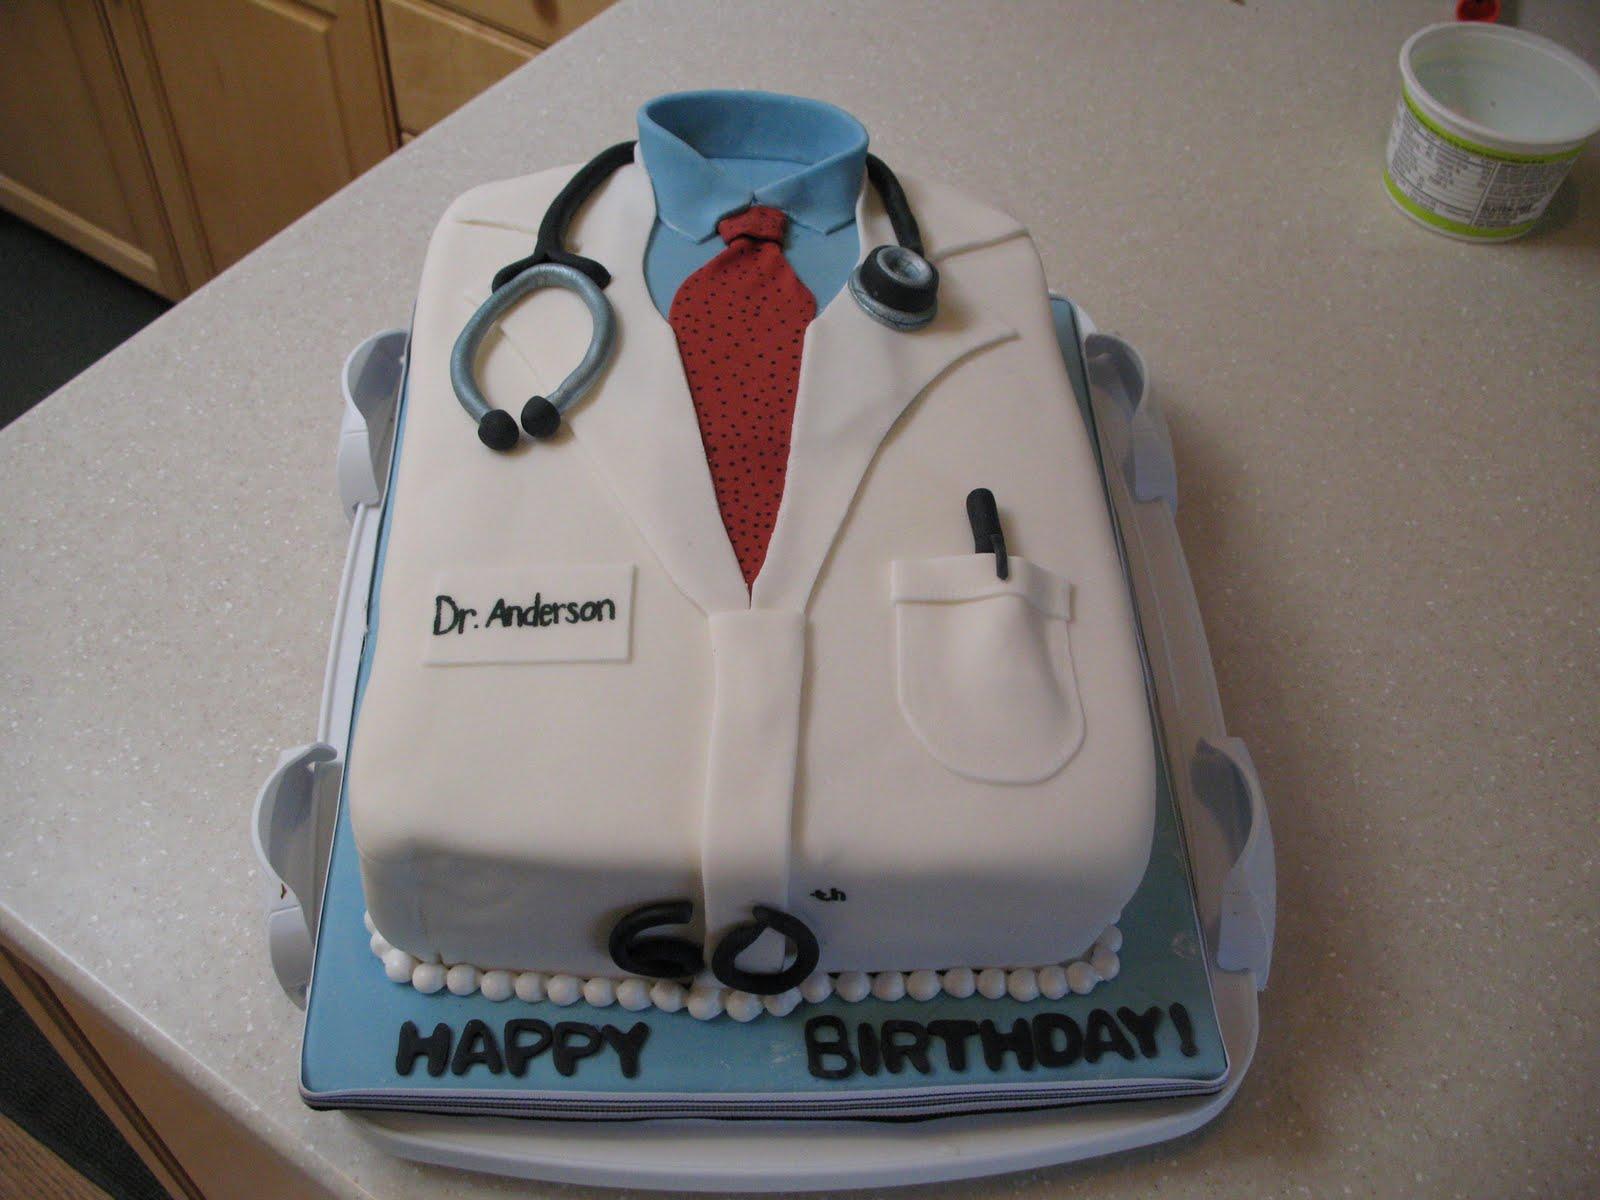 Doctor Birthday Cake Ideas Image Inspiration of Cake and Birthday